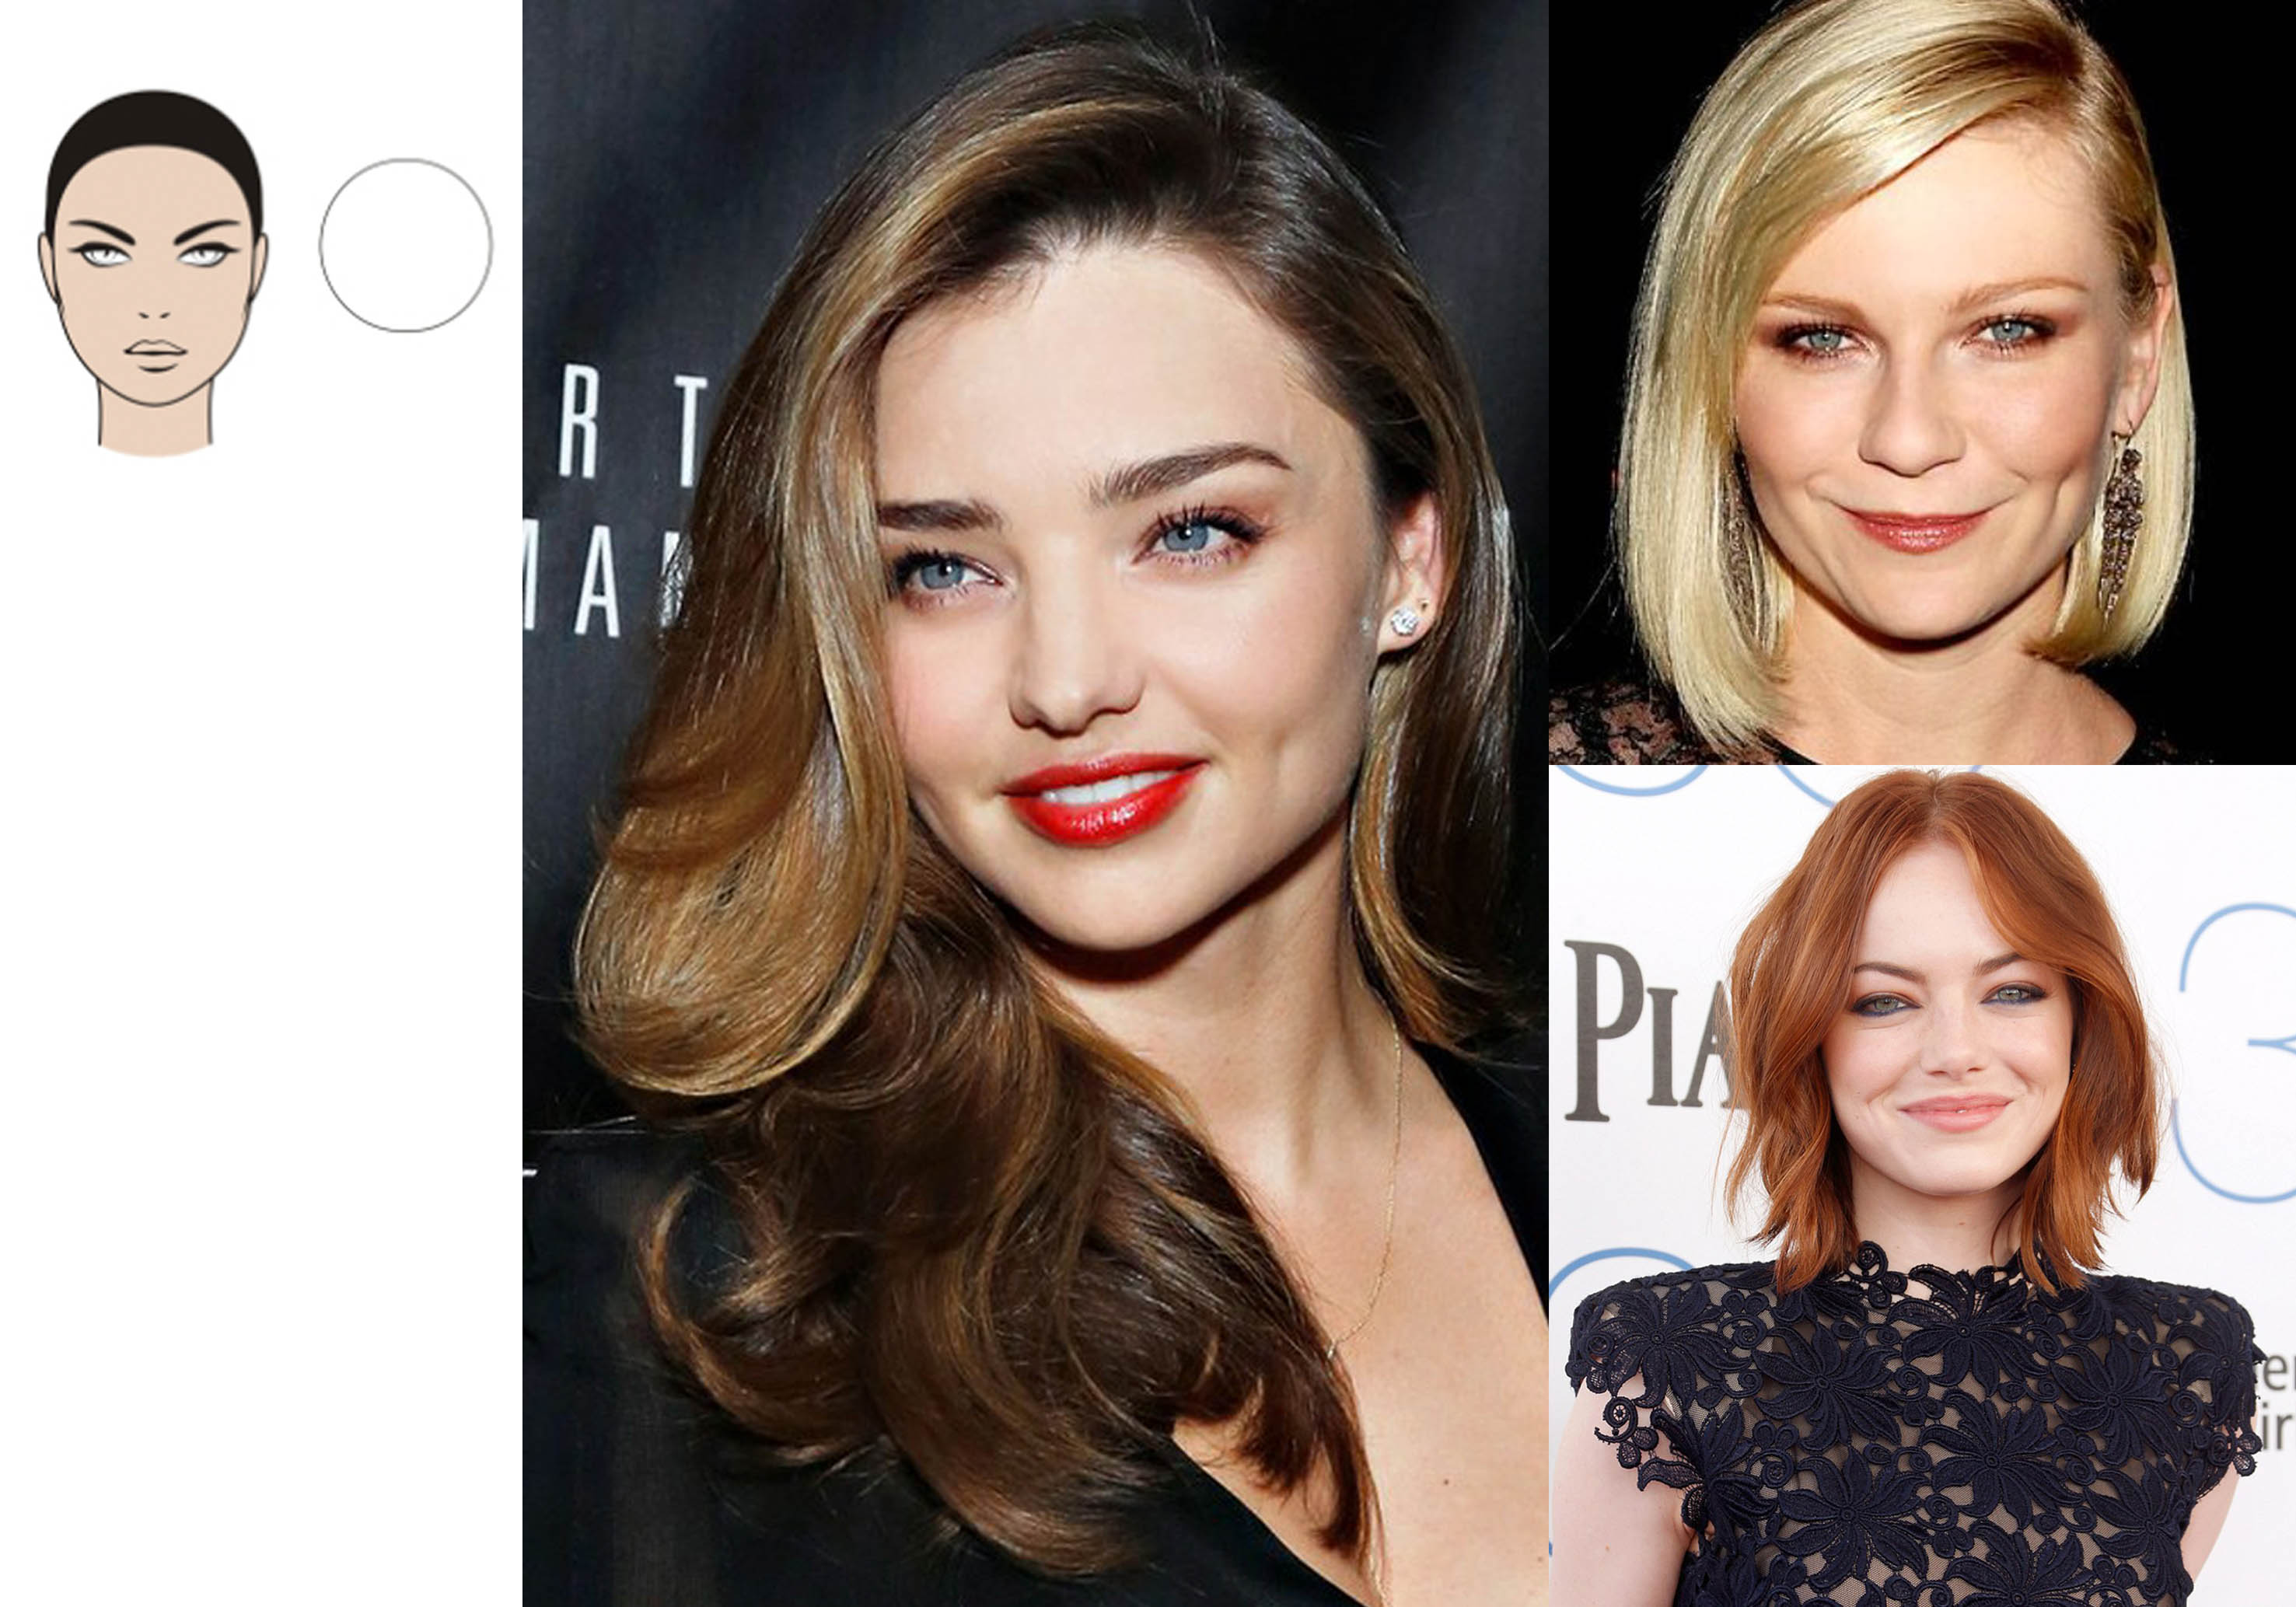 Ini Model Rambut yang Sesuai Bentuk Wajah agar Lebih Proporsional